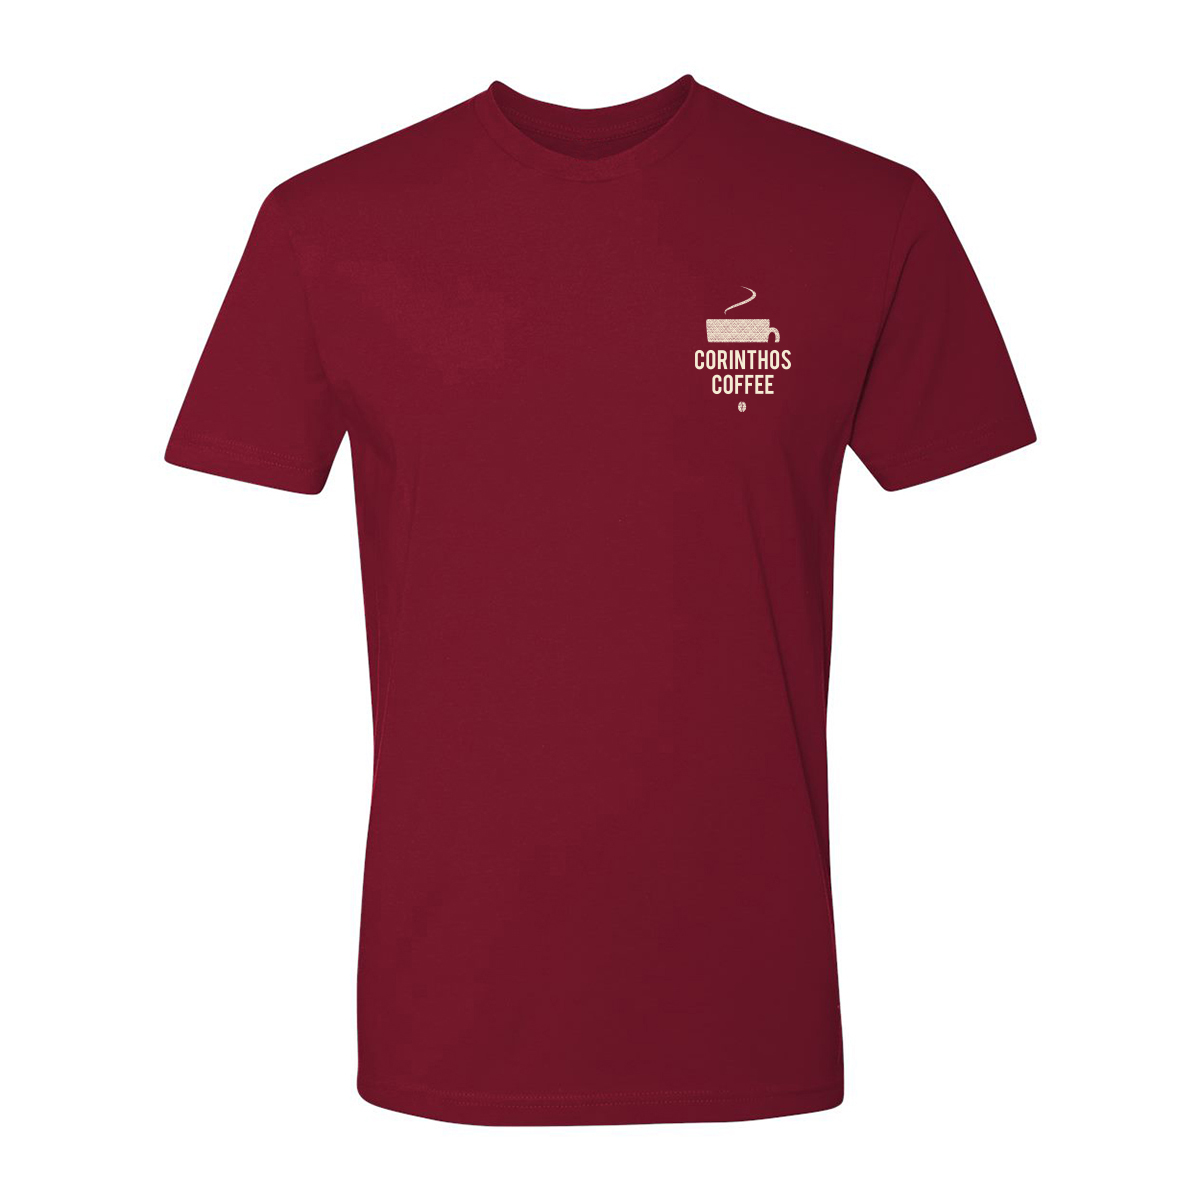 General Hospital Corinthos Coffee Logo T-Shirt